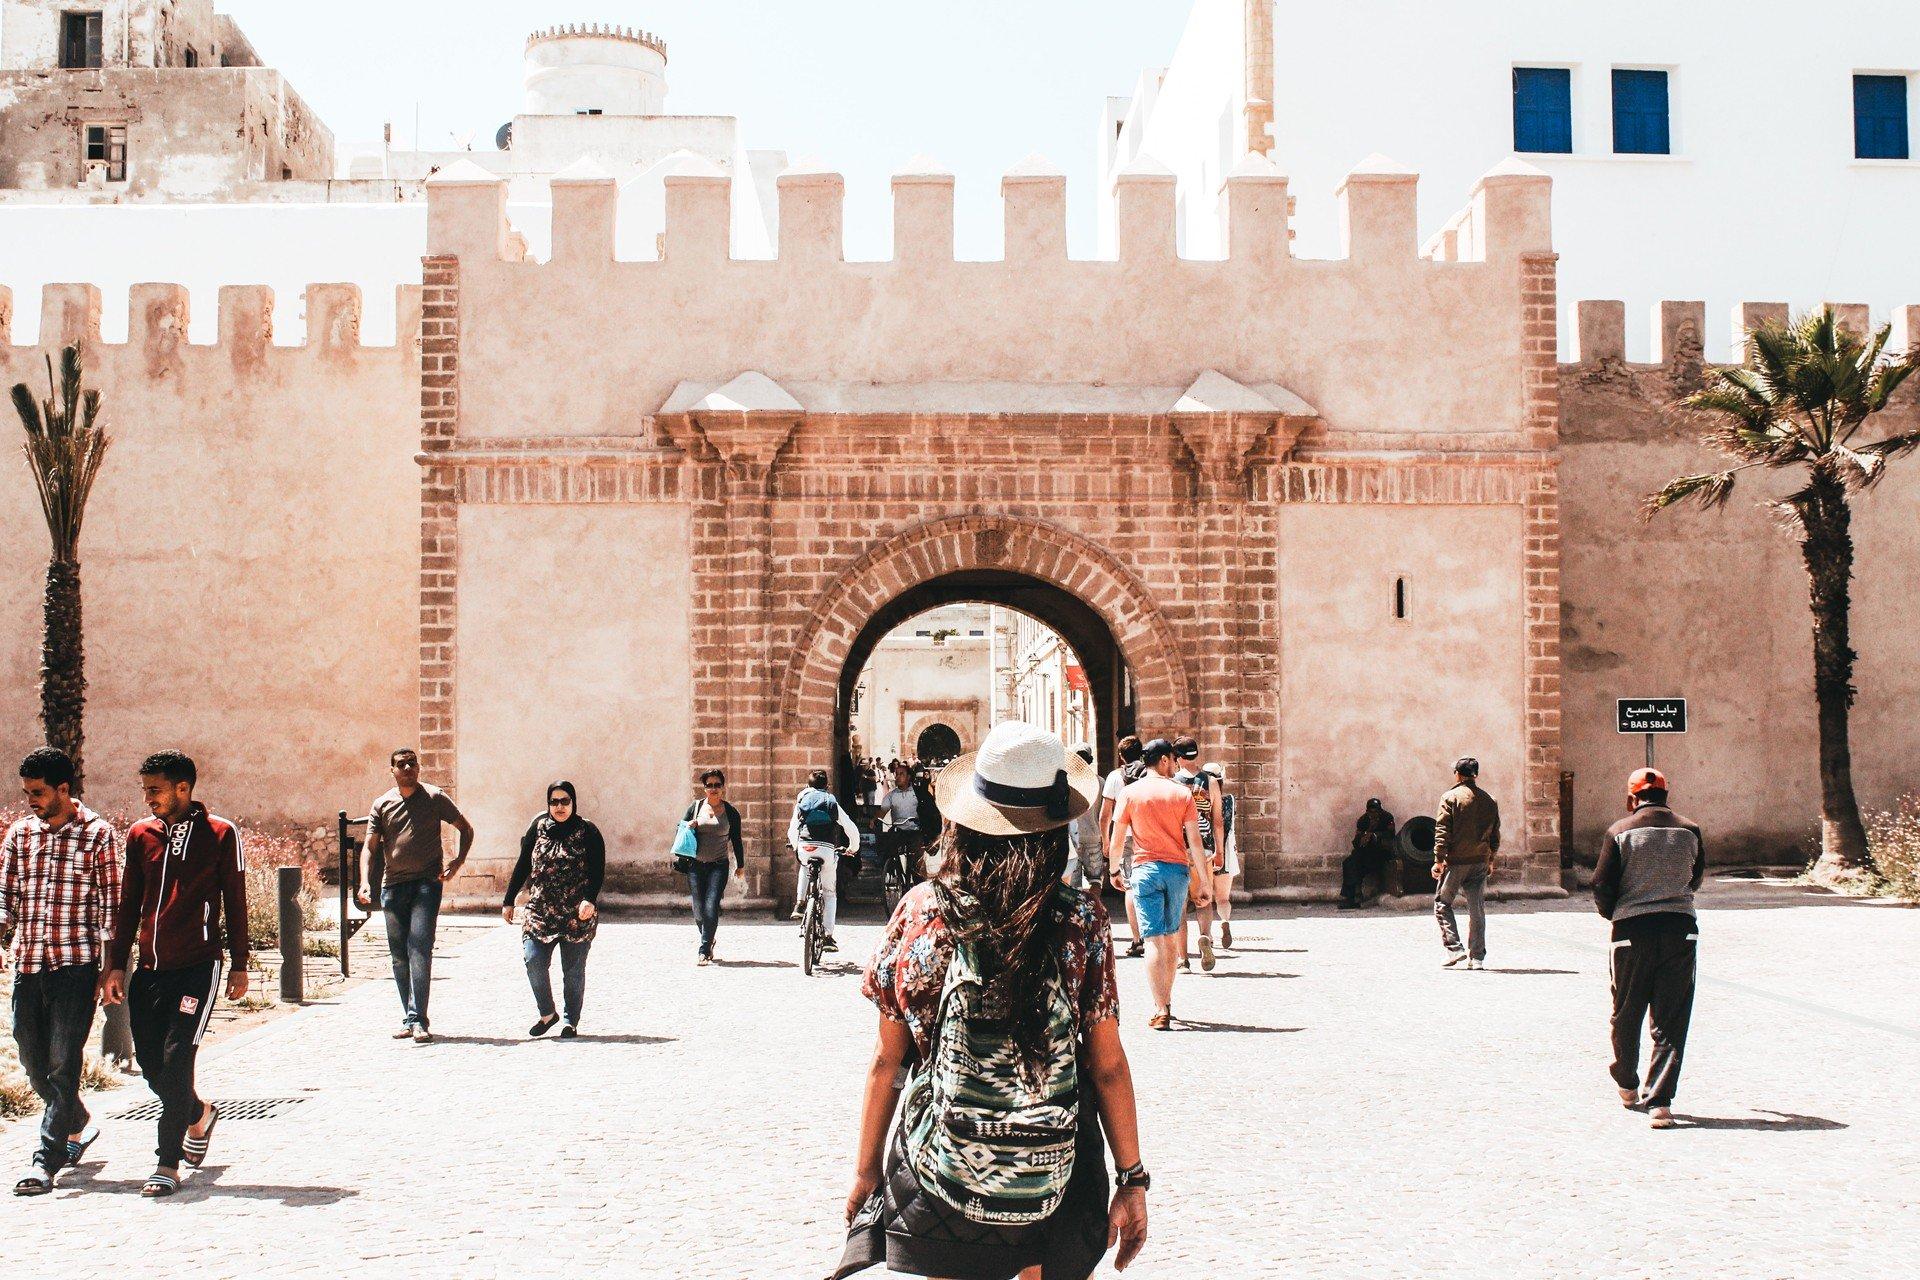 Comment venir à Essaouira?